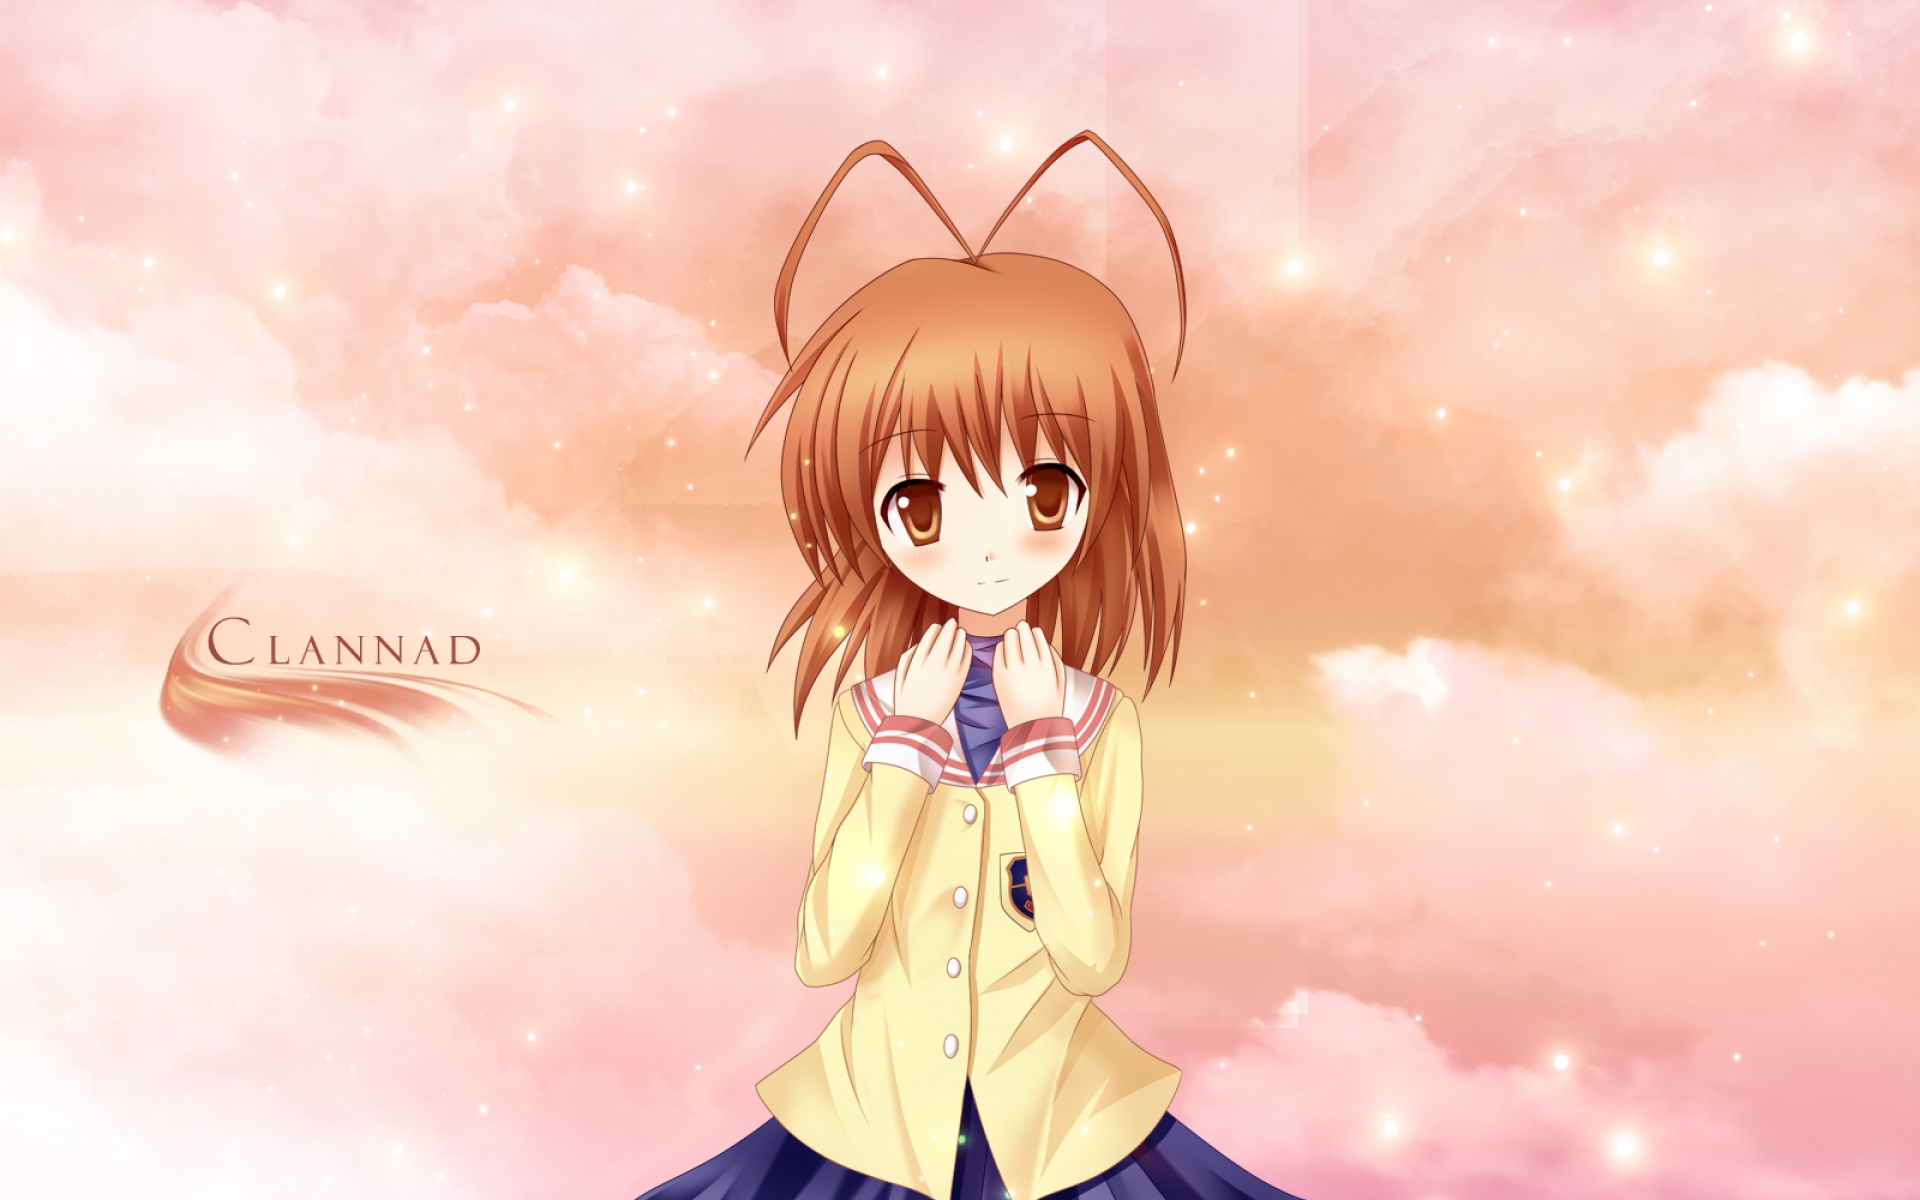 Картинки Clannad, furukawa nagisa, девушка, юбка, небо фото и обои на рабочий стол